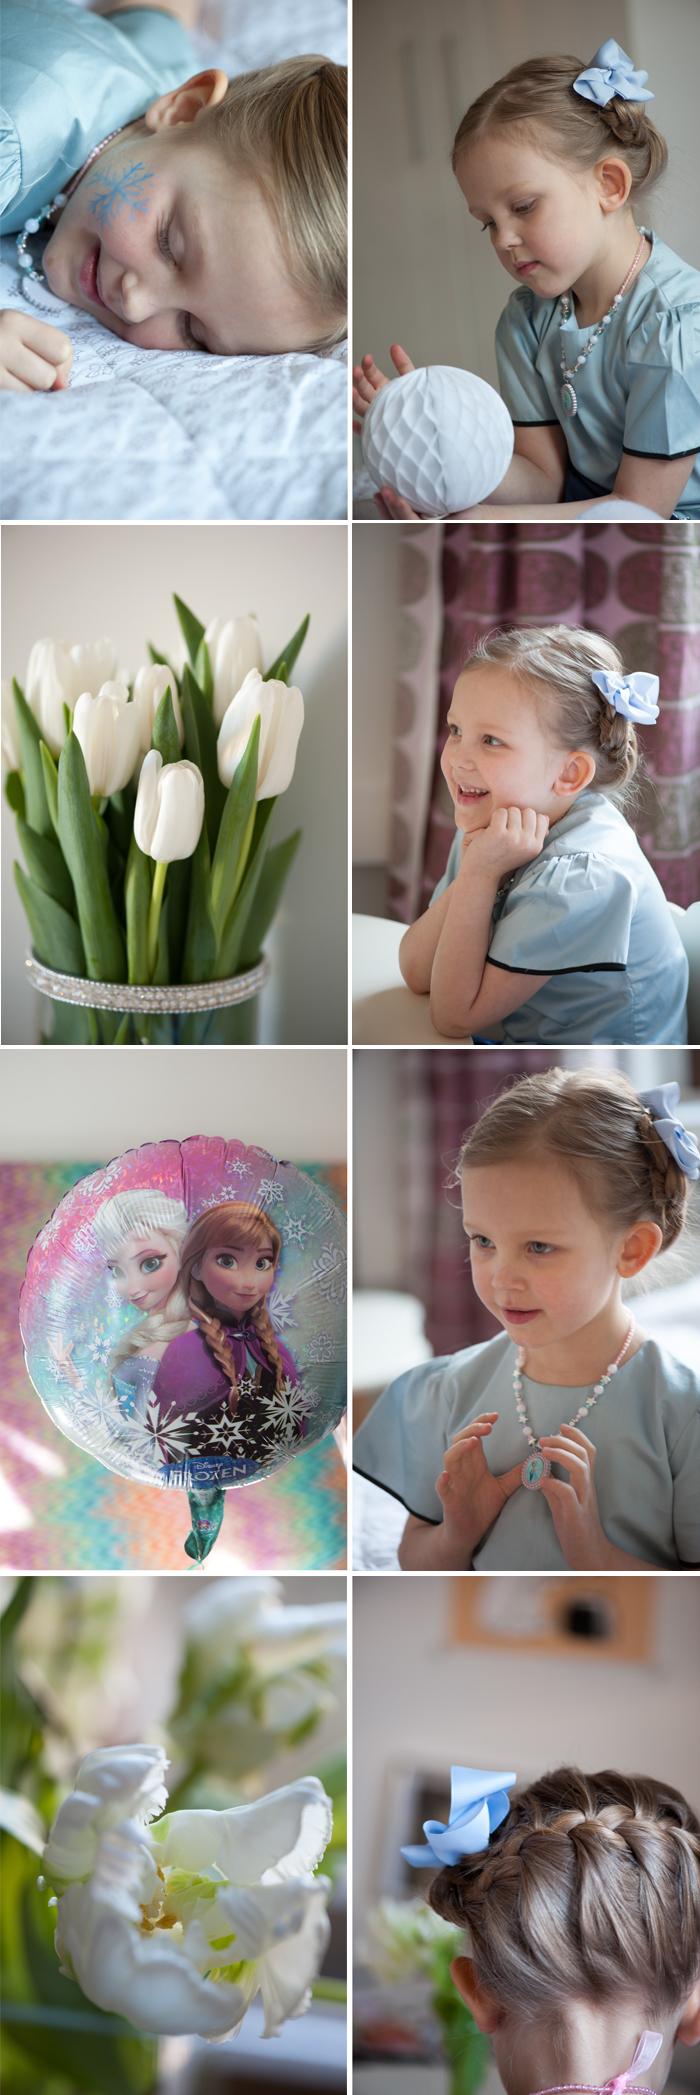 femåriga freja_edited-1